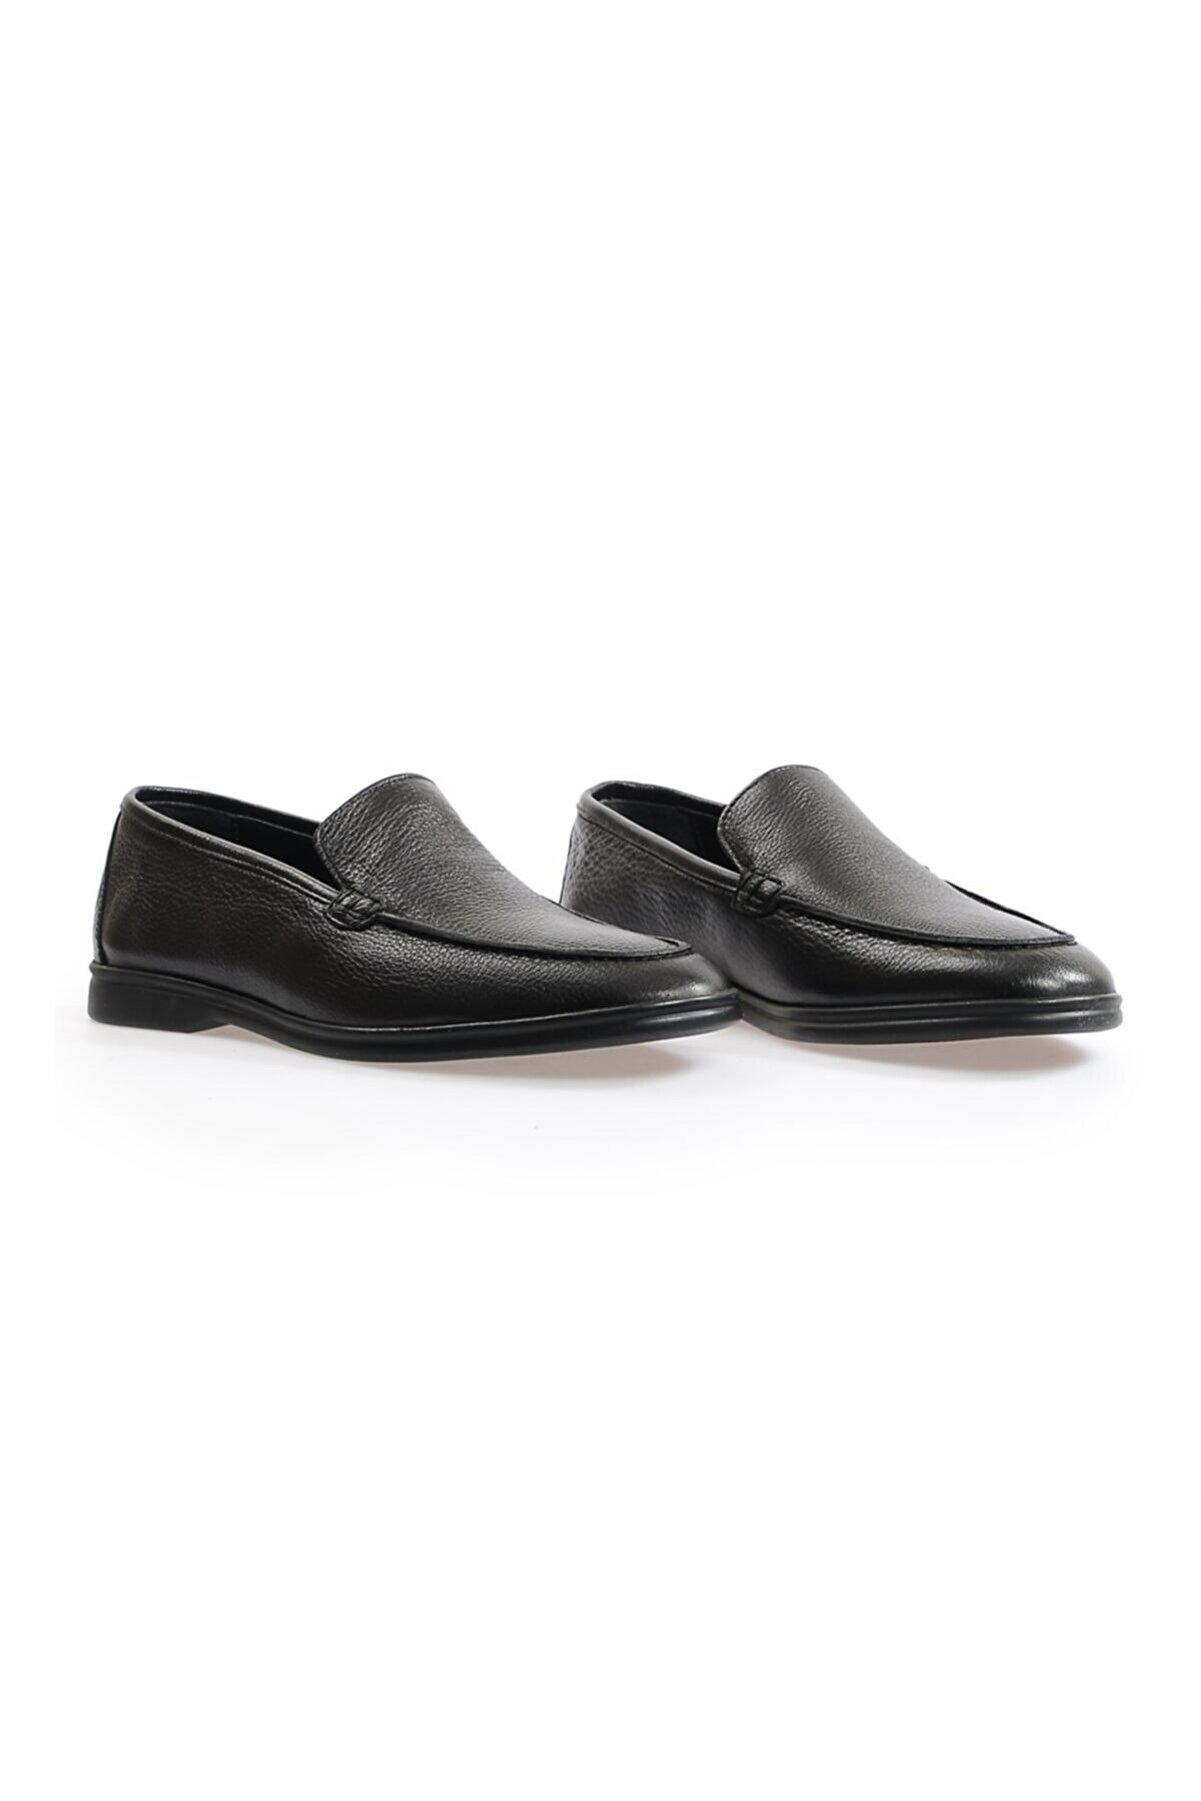 Flower Siyah Deri Loafer Ayakkabı